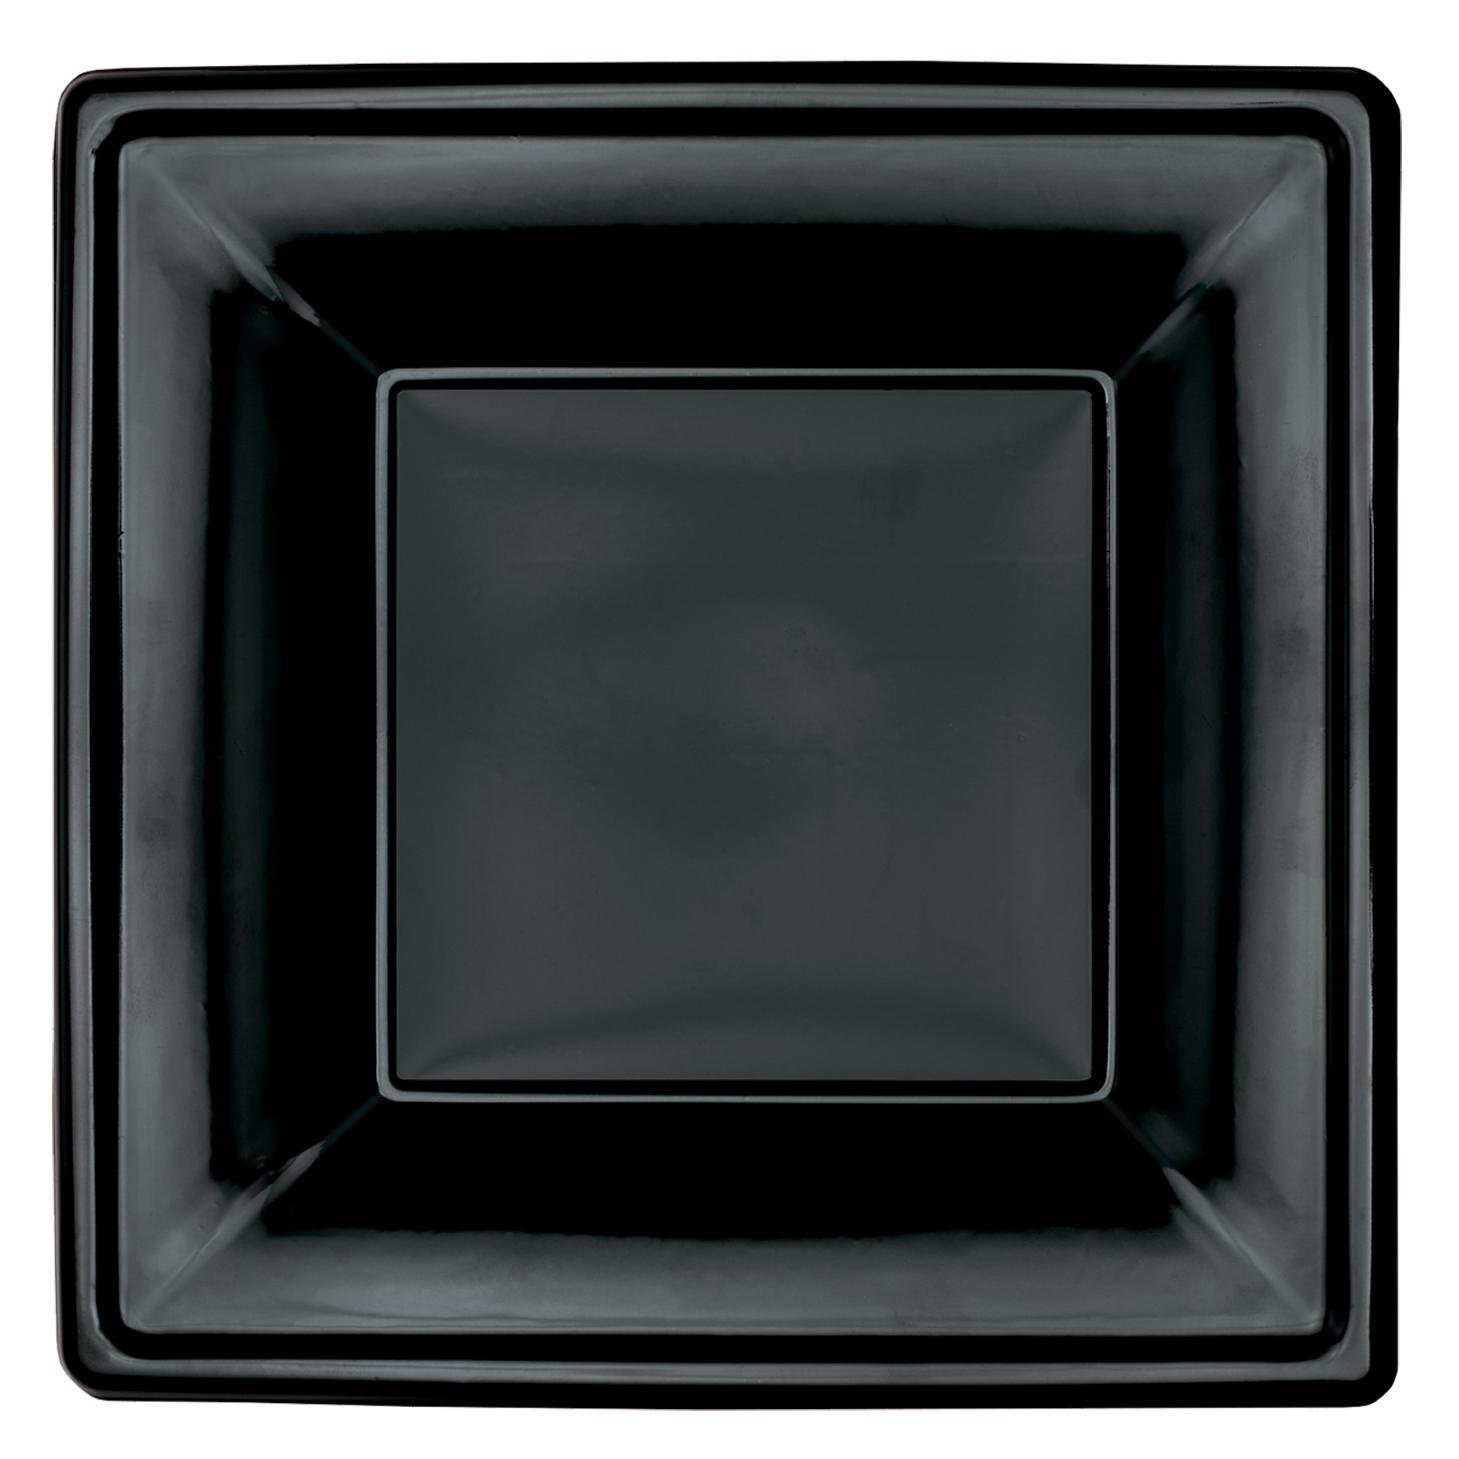 einweg plastikteller men teller g nstig kaufen einweggeschirr shop. Black Bedroom Furniture Sets. Home Design Ideas